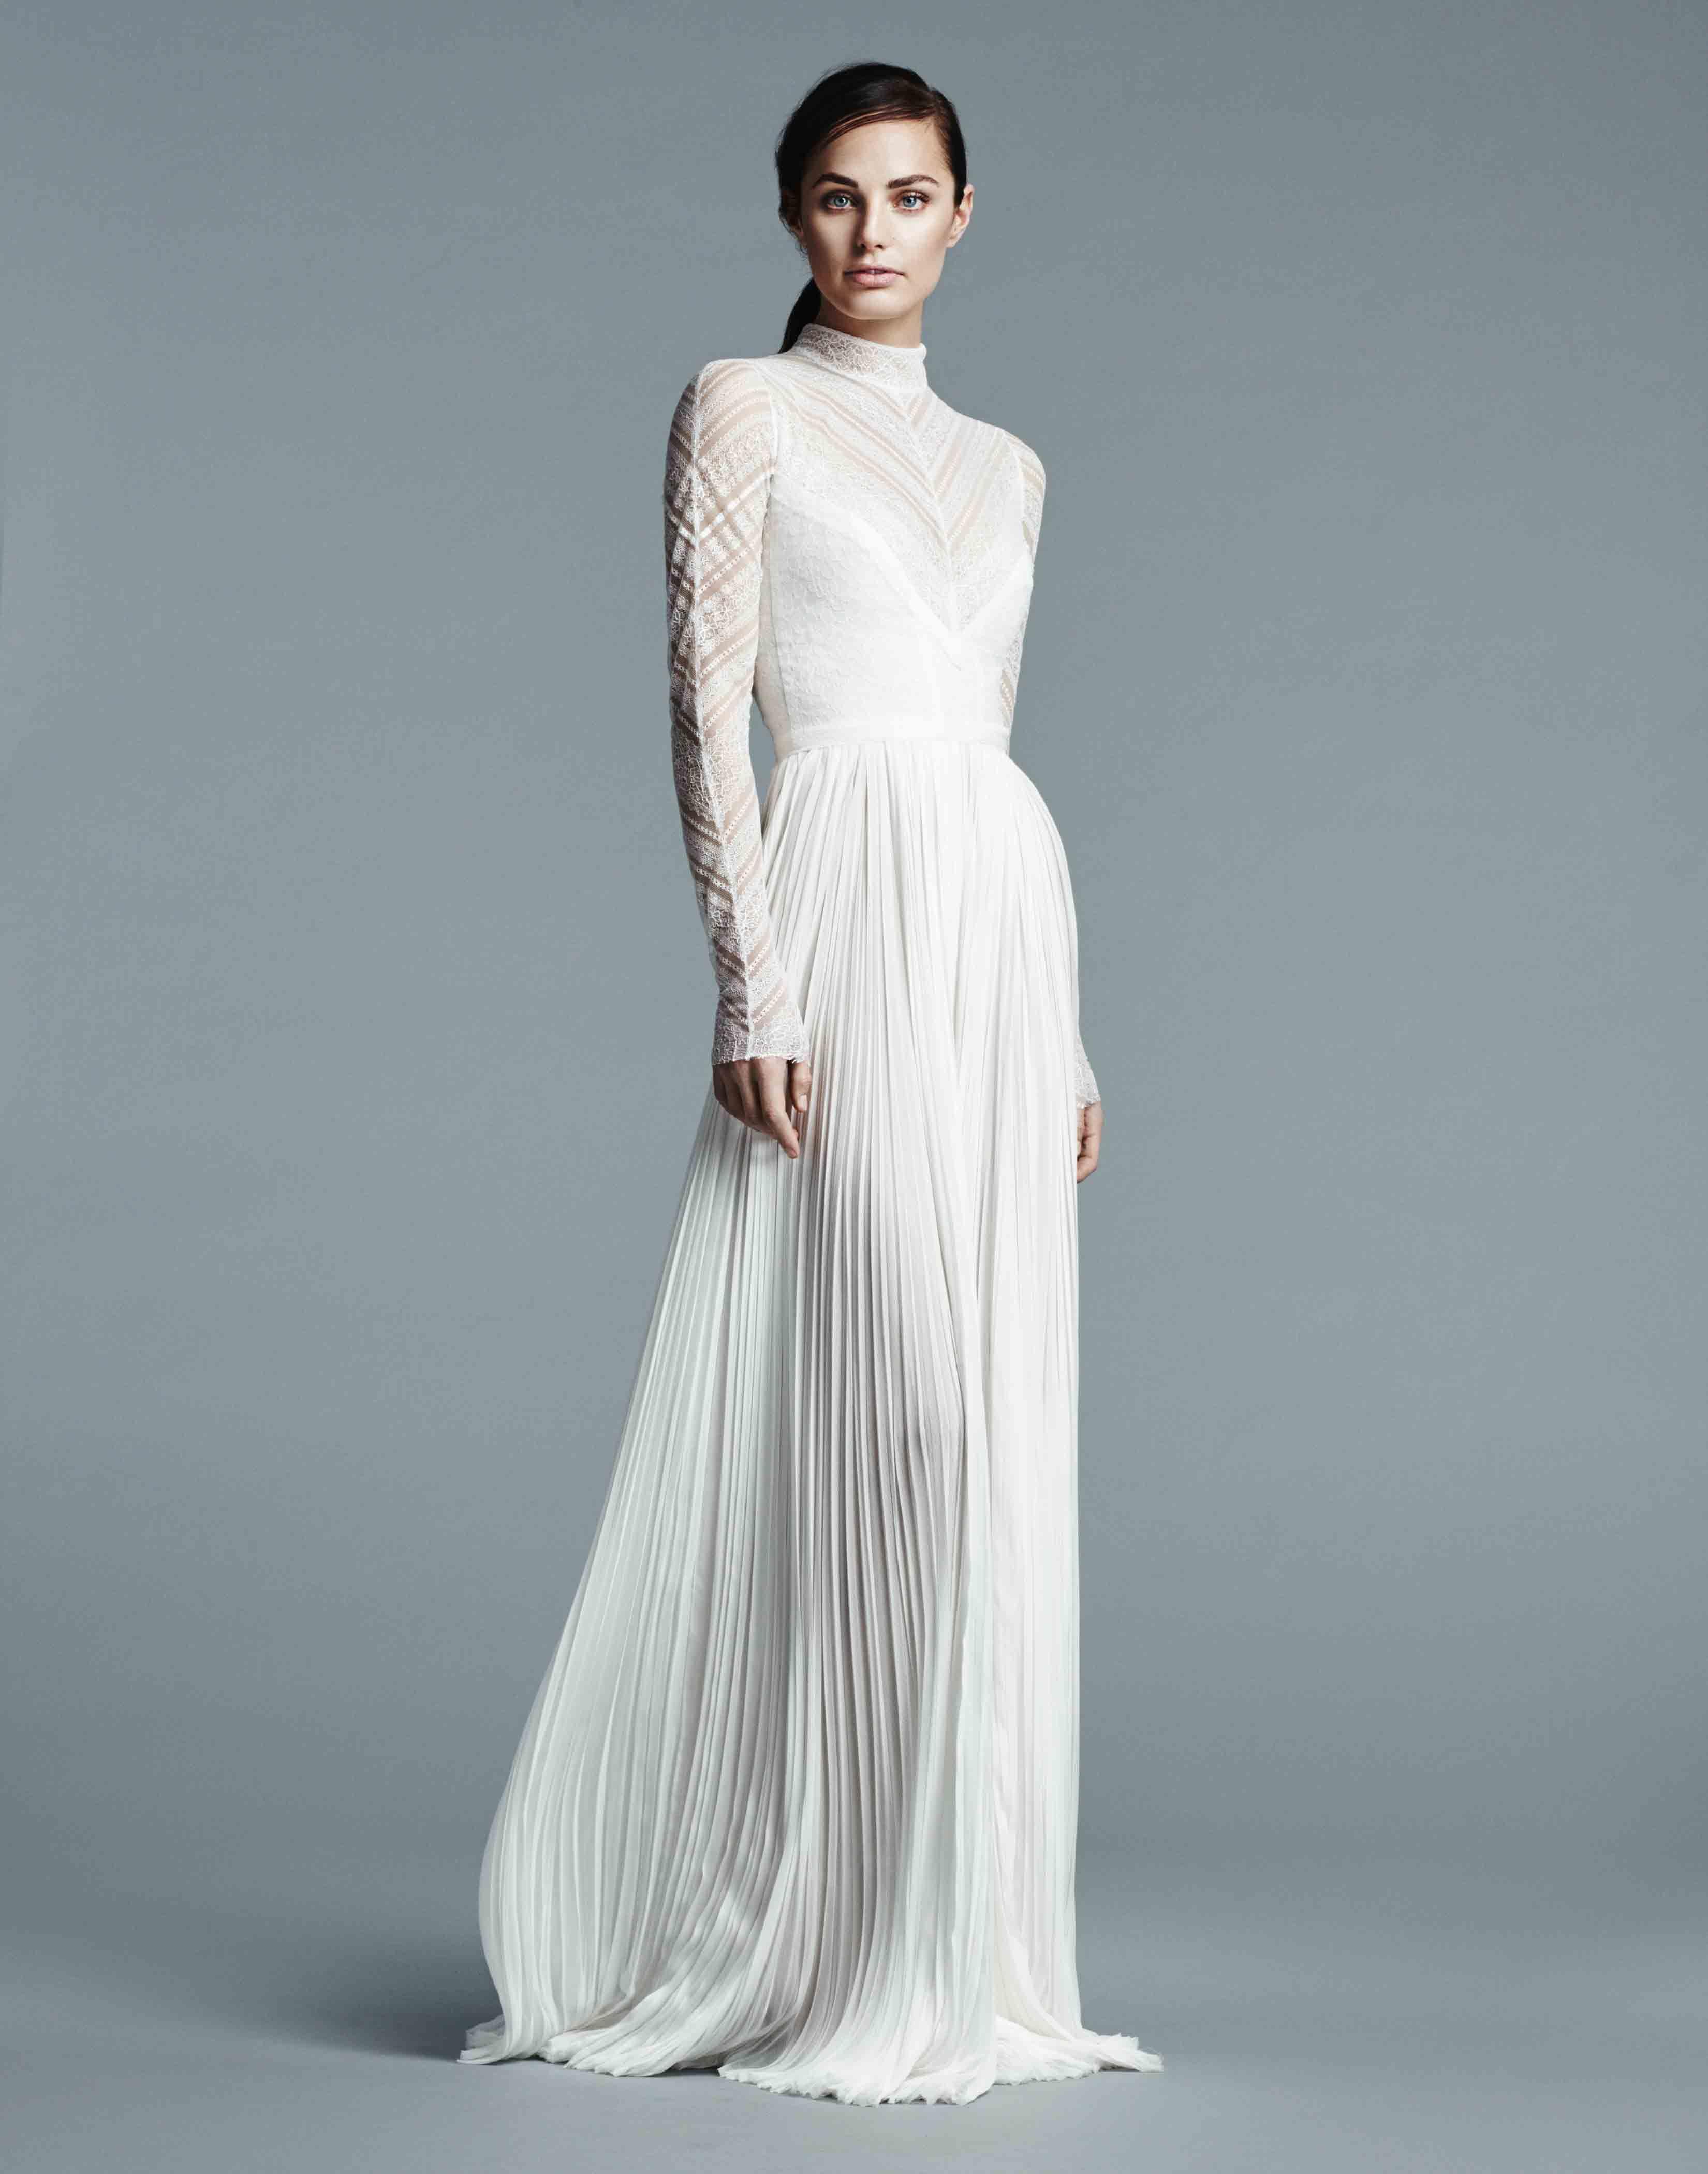 luscious long sleeve wedding dresses for wedding dress